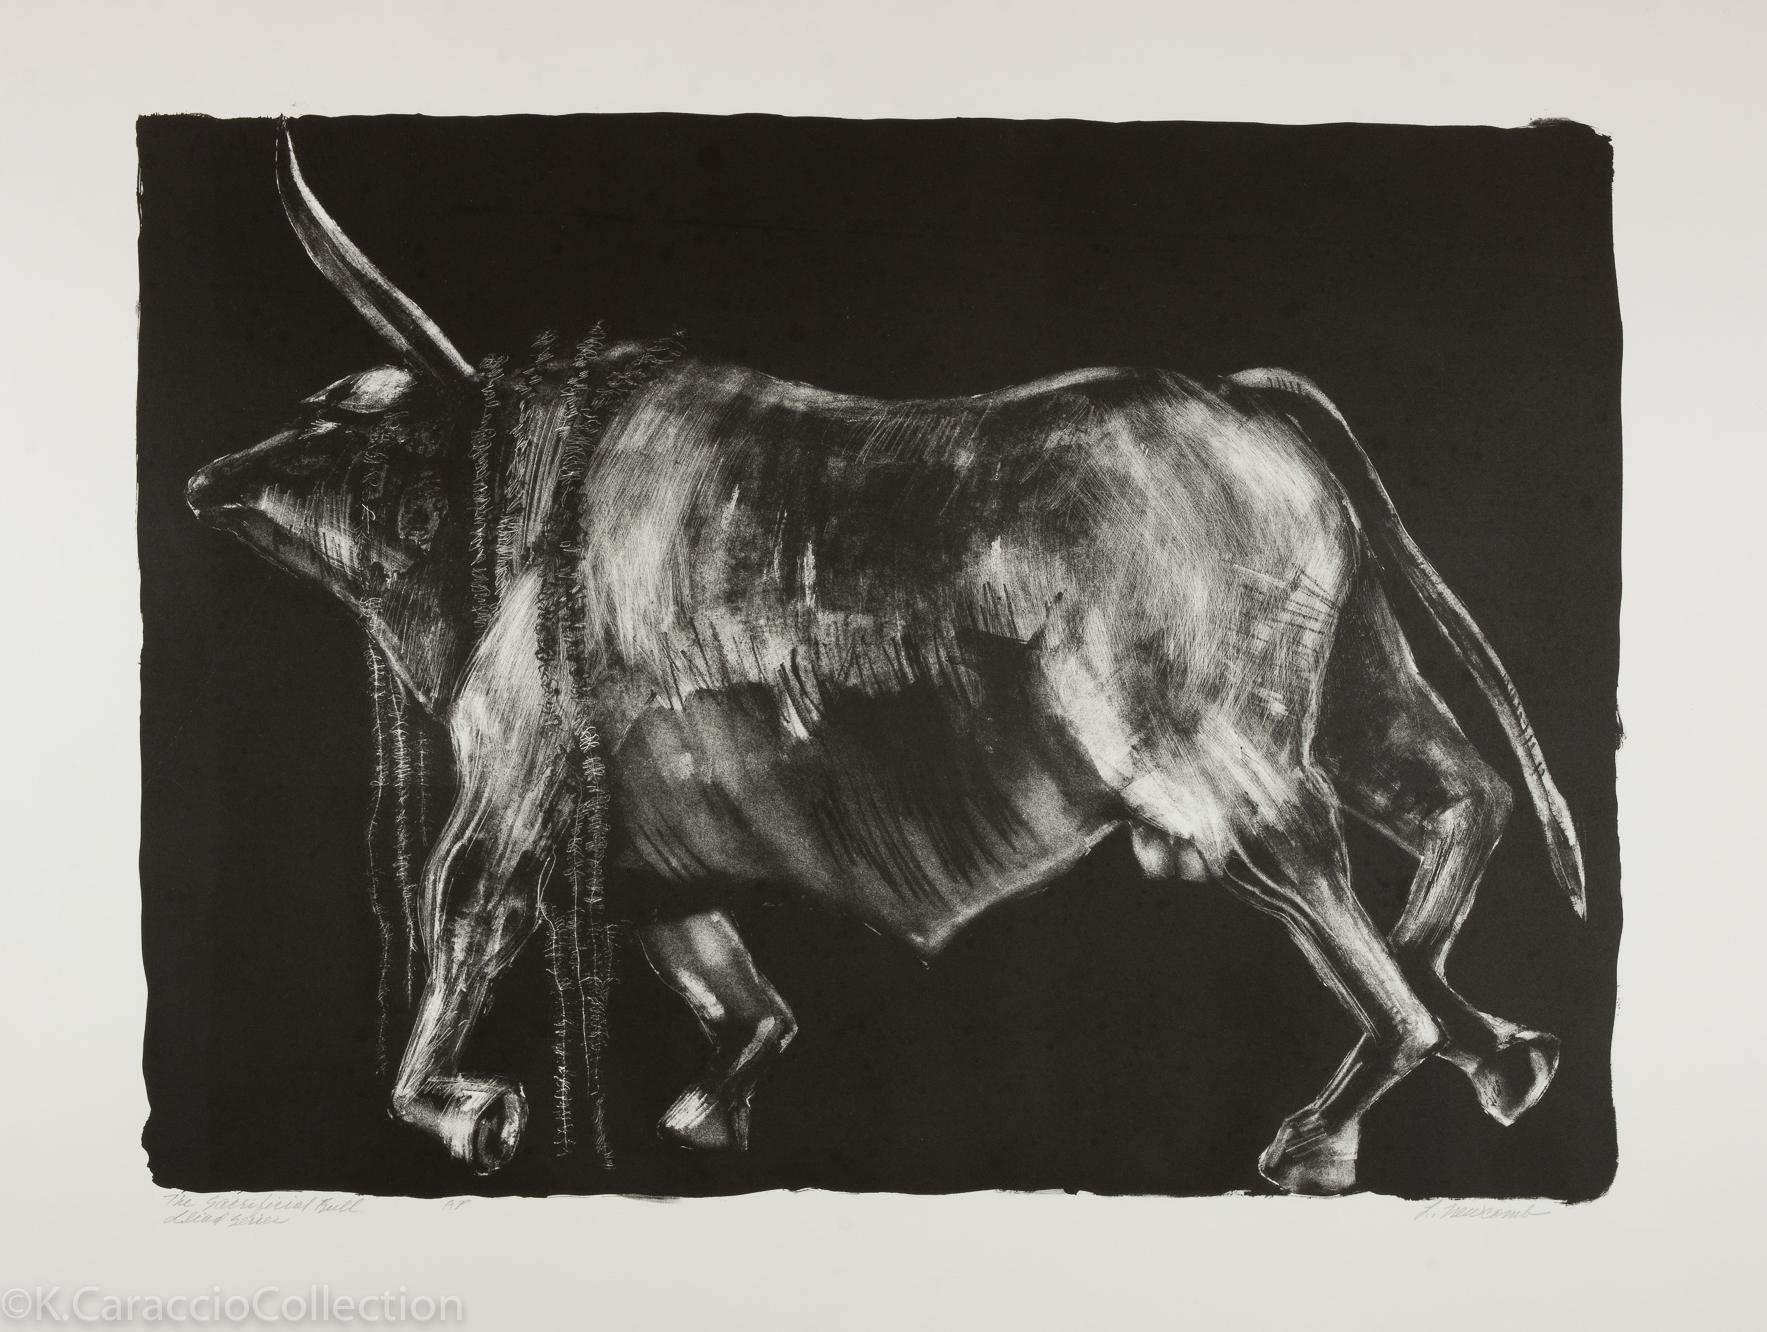 Sacrificial Bull, 2016